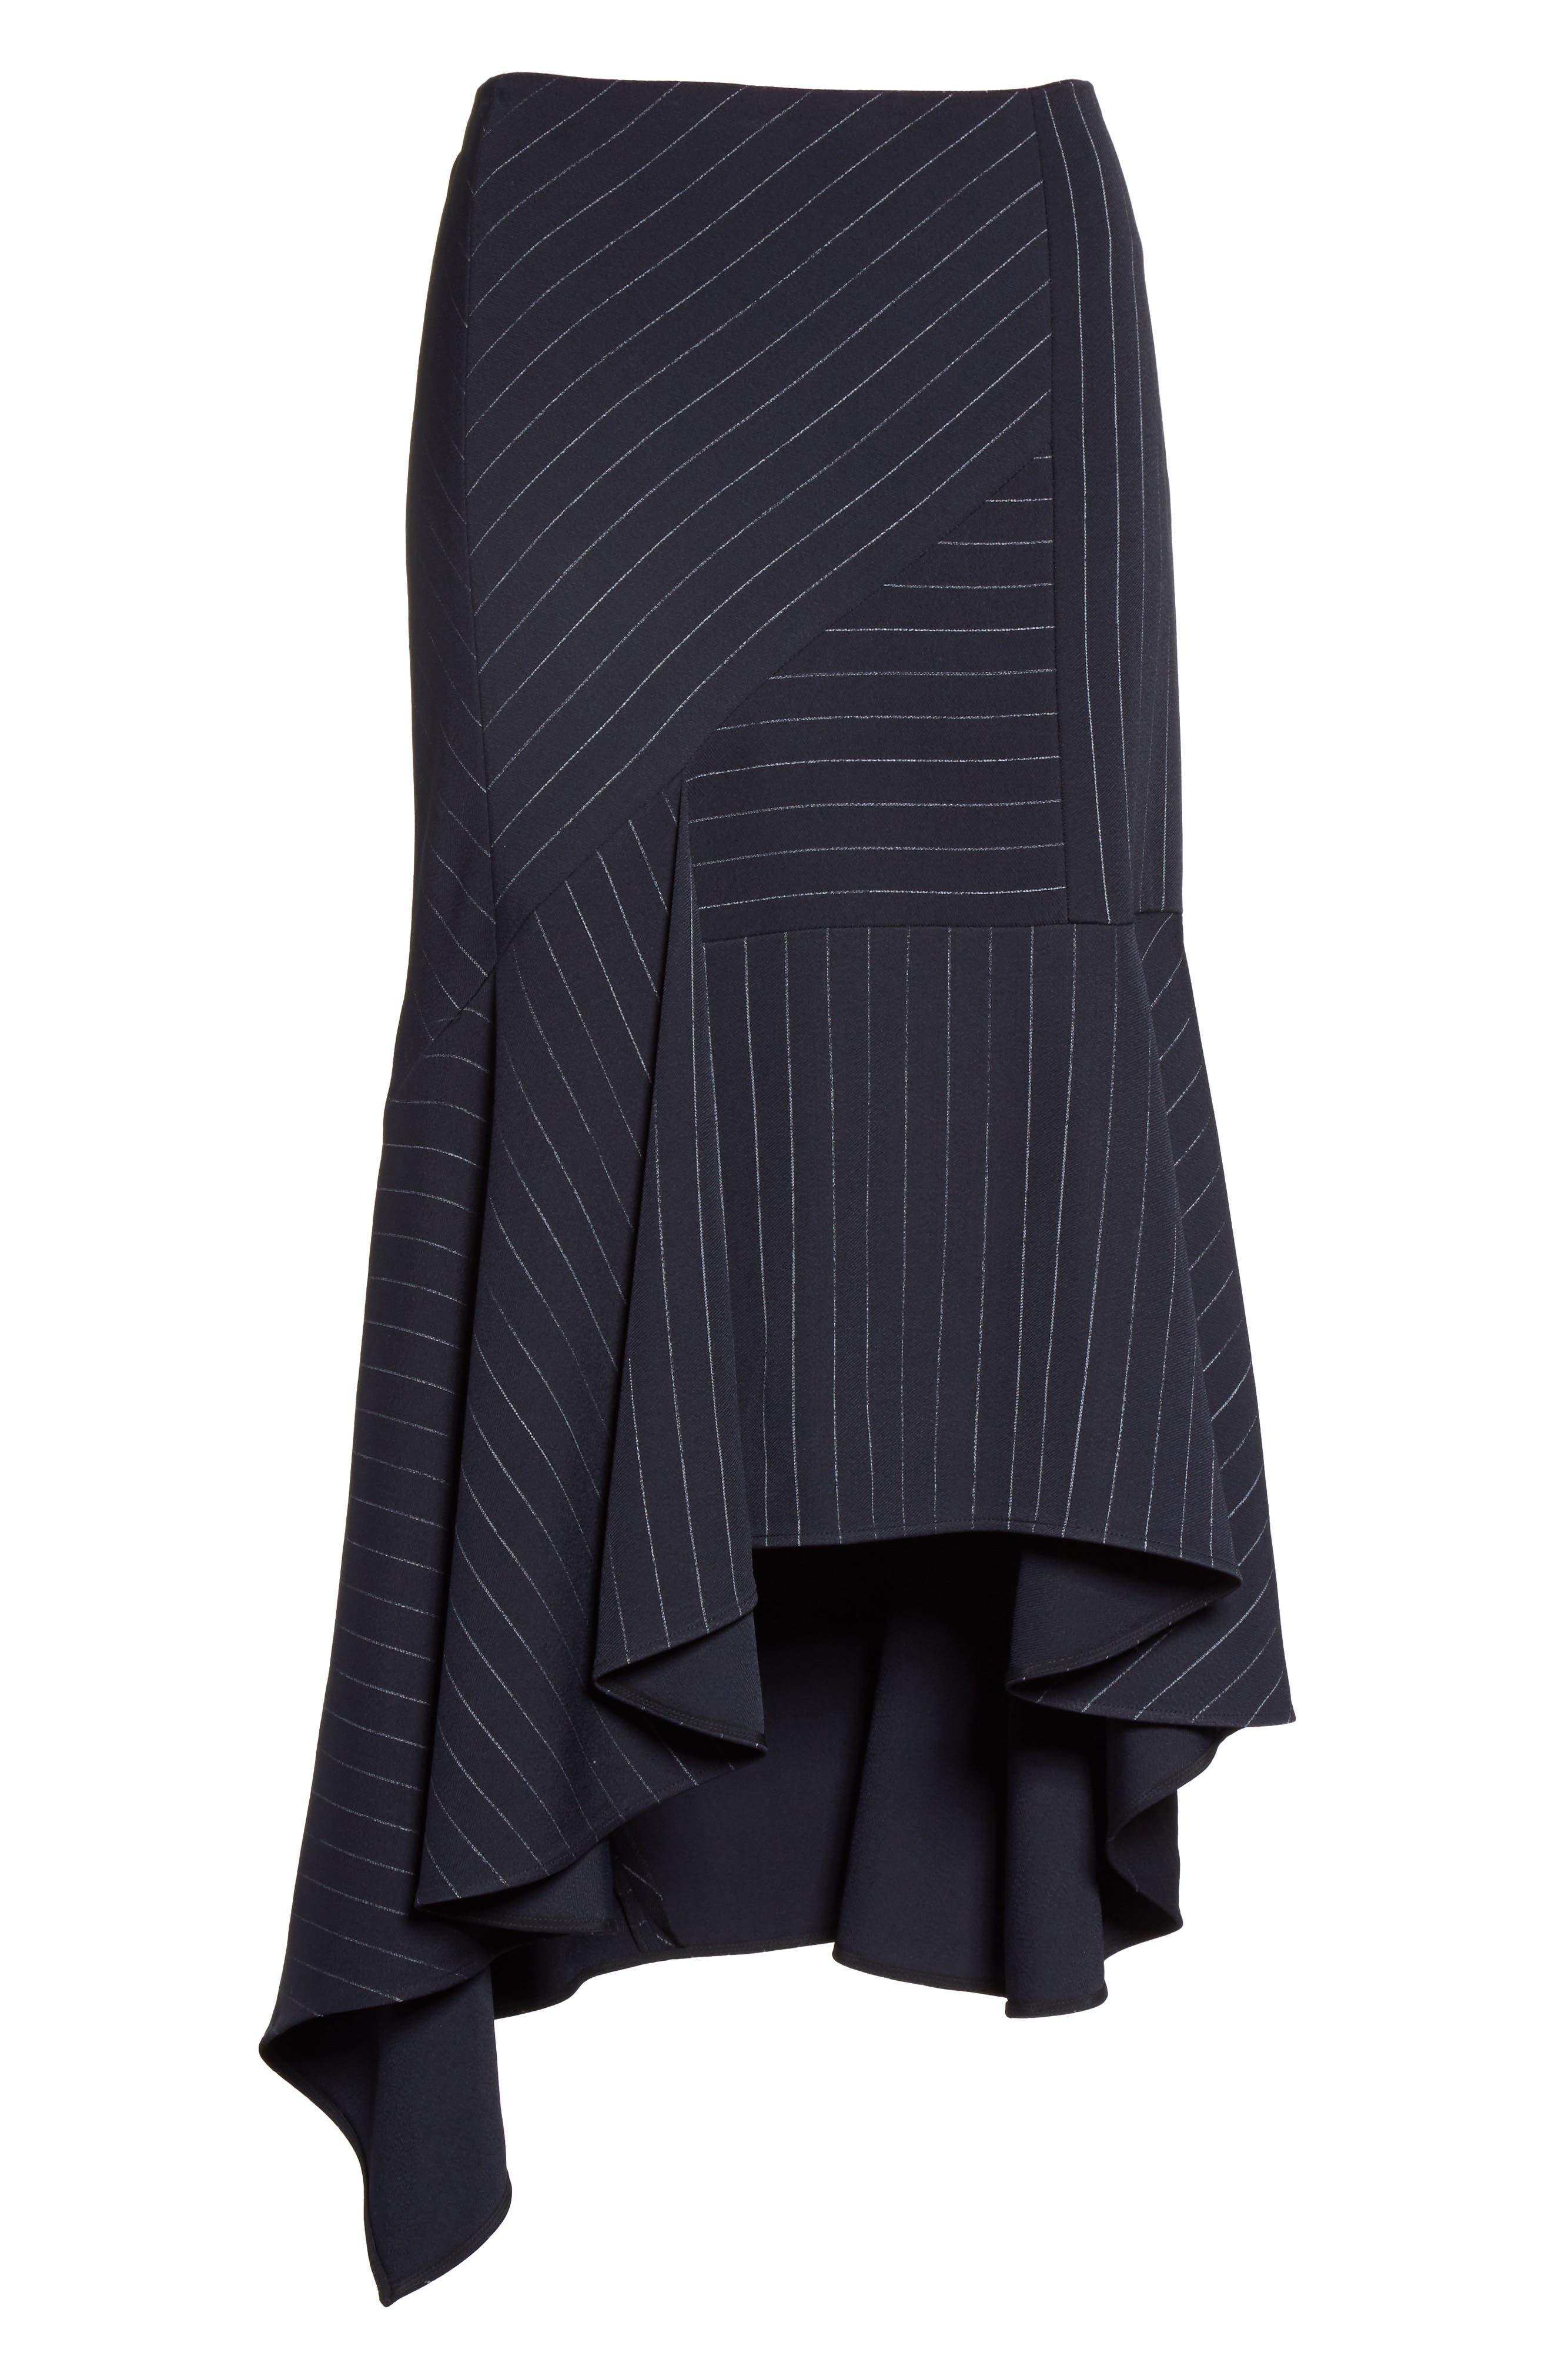 Pinstripe Stretch Asymmetrical Skirt,                             Alternate thumbnail 4, color,                             Black/ Chalk